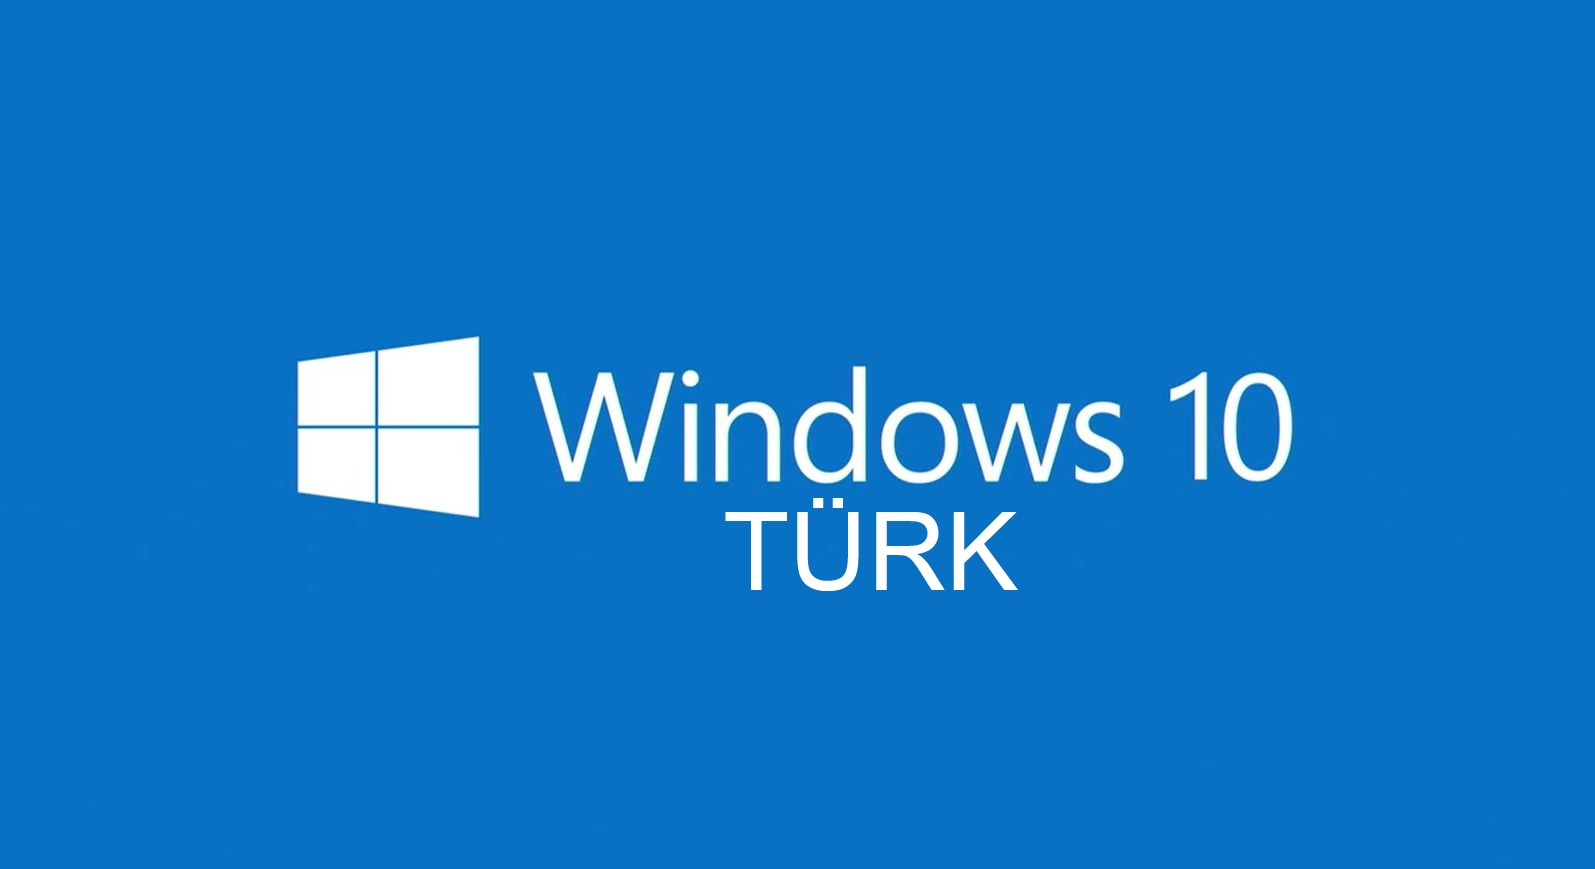 Windows 10 May 2016 AIO TR [x86/x64]